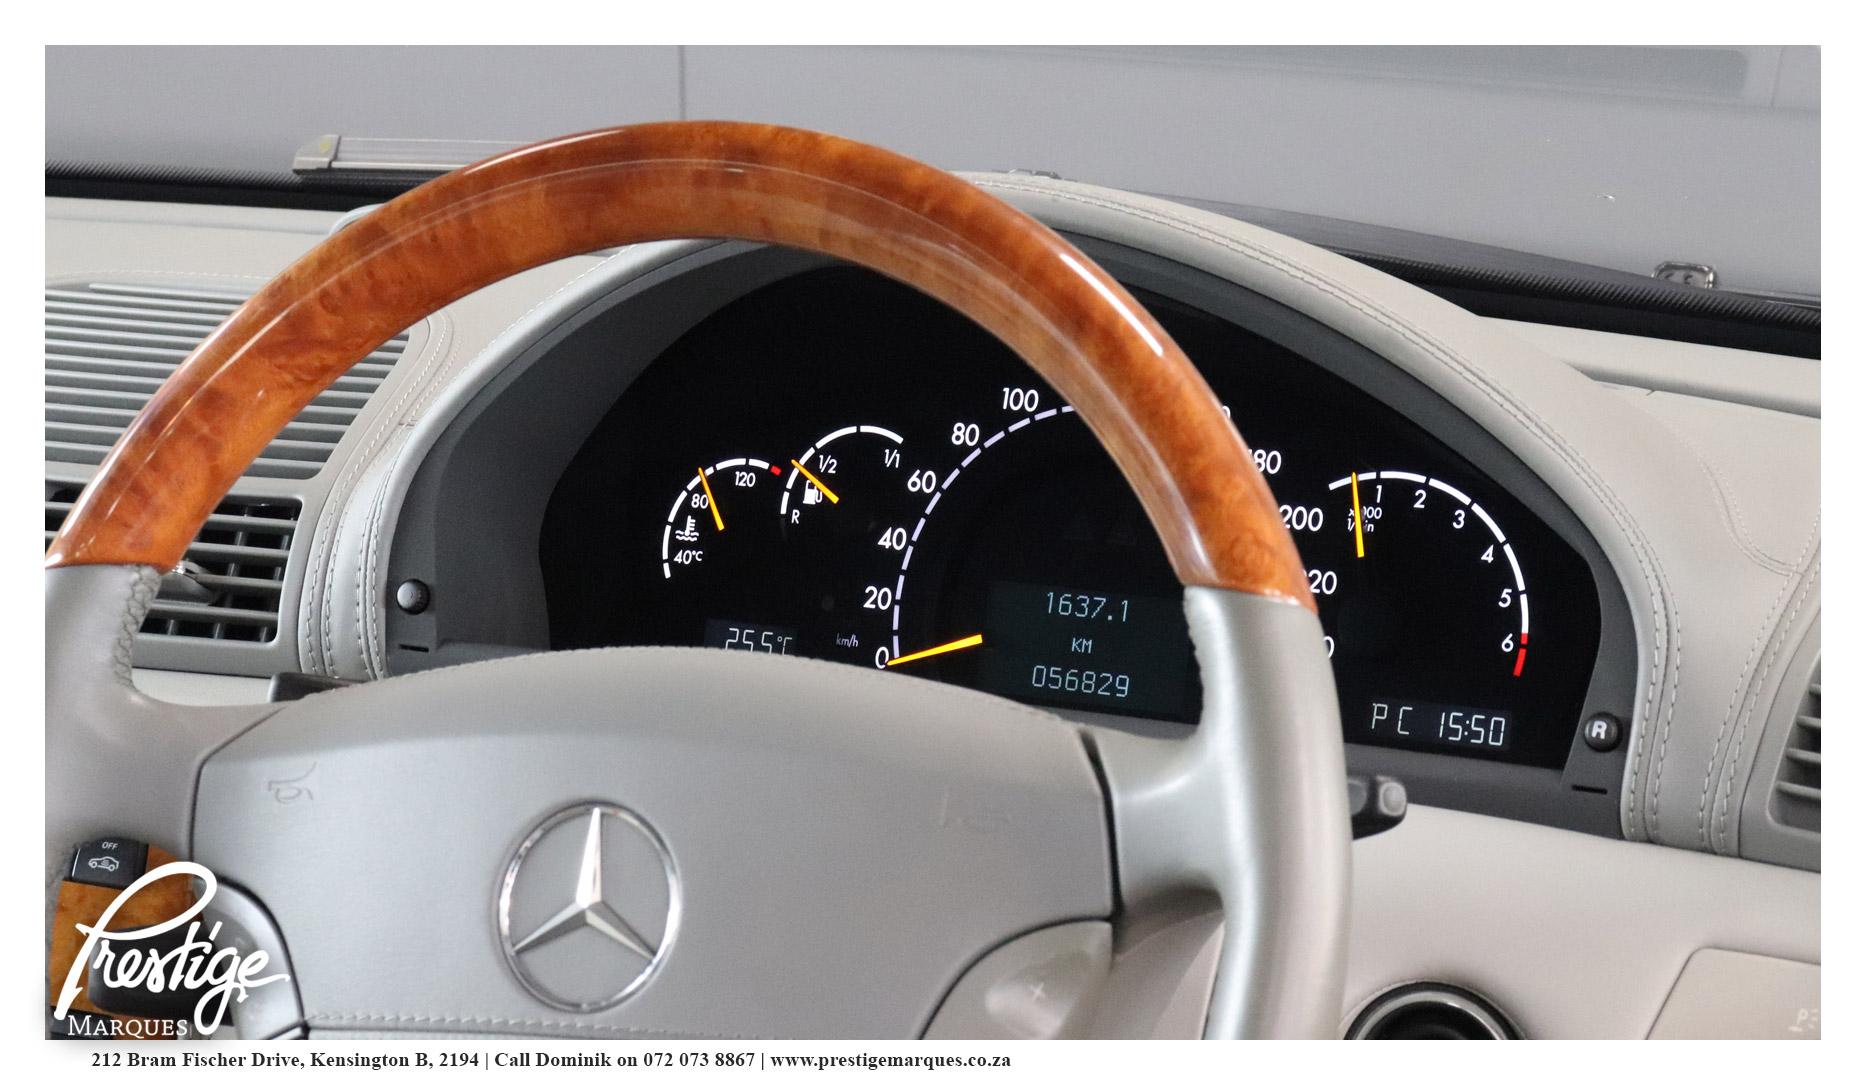 2005-Mercedes-Benz-CL-600-Coupe-Prestige-Marques-Randburg-Sandton-14